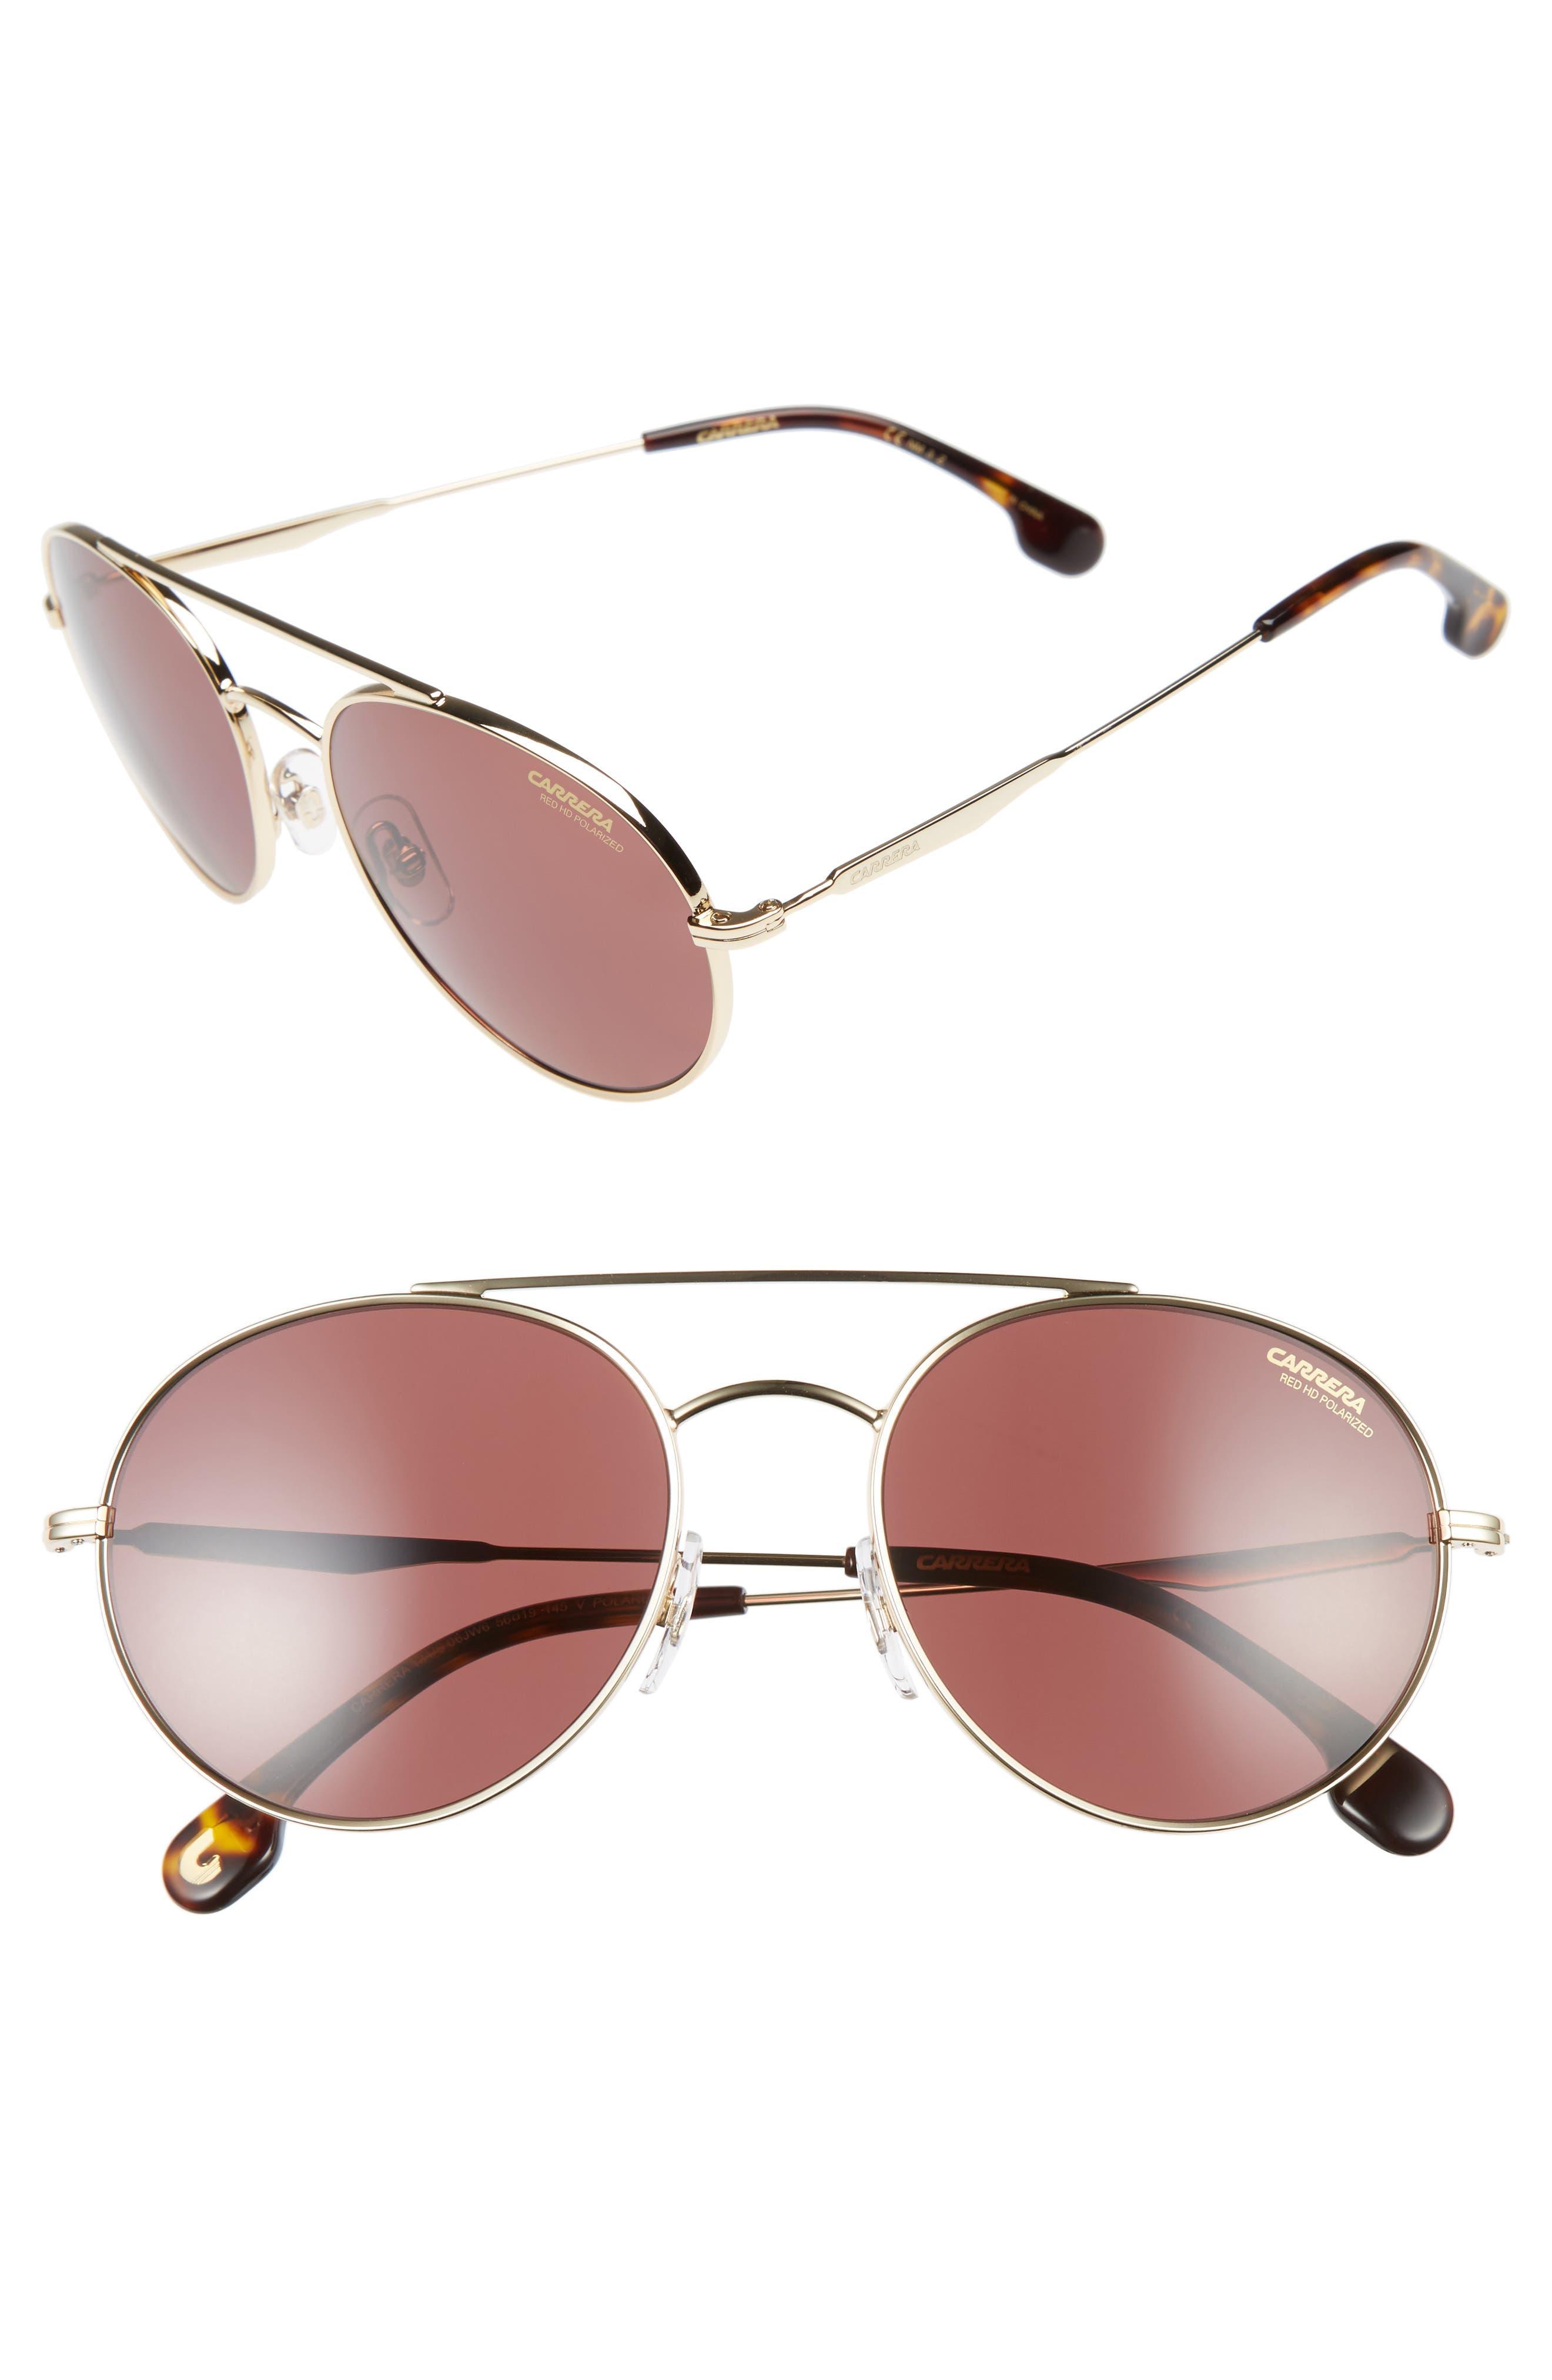 Main Image - Carrera Eyewear 59mm Polarized Sunglasses